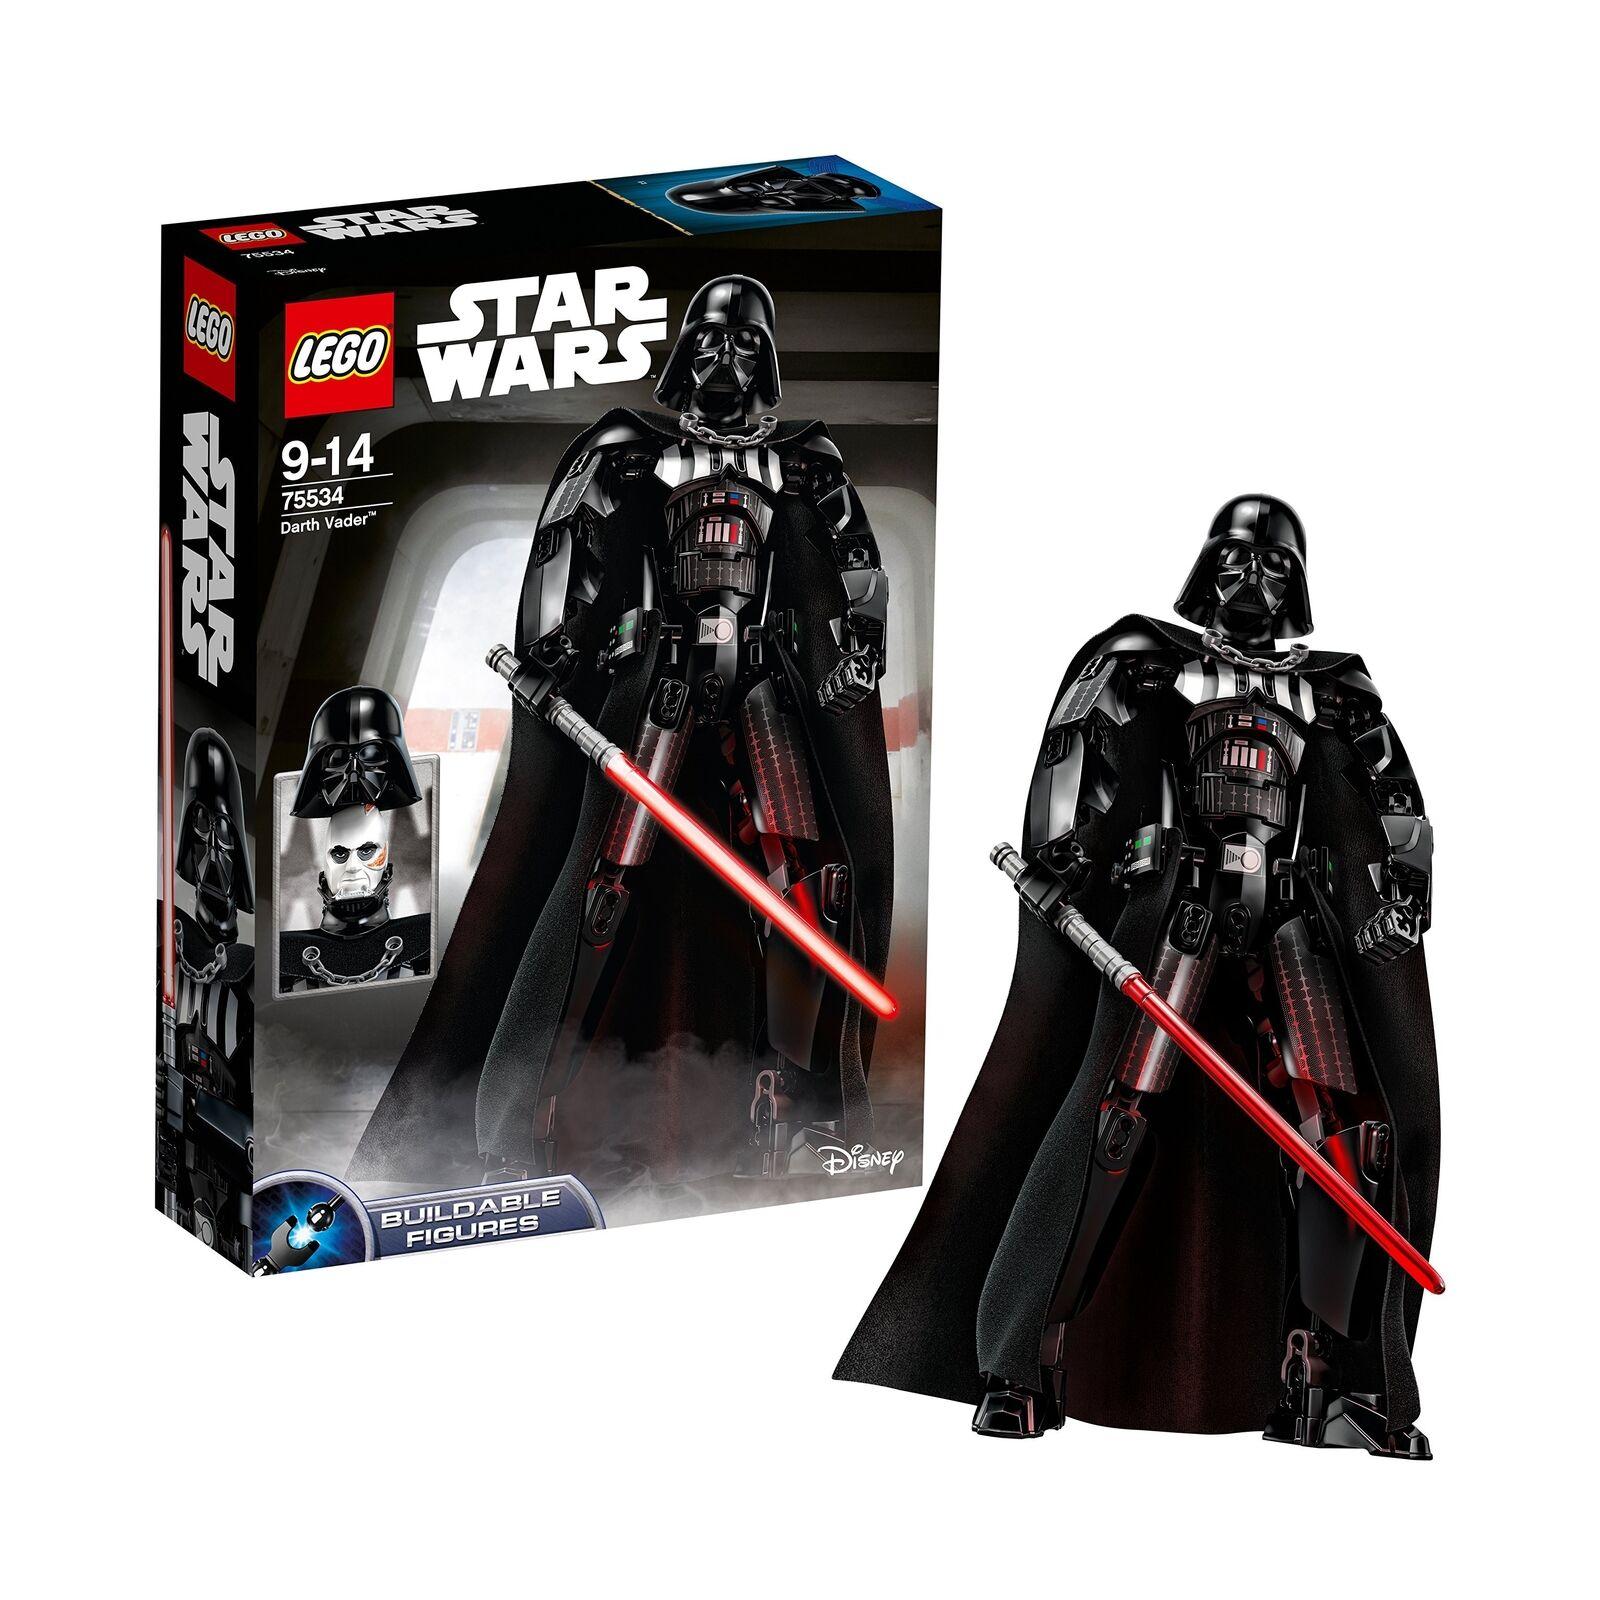 LEGO Star Wars Darth Vader TEMPERAMATITE figura.